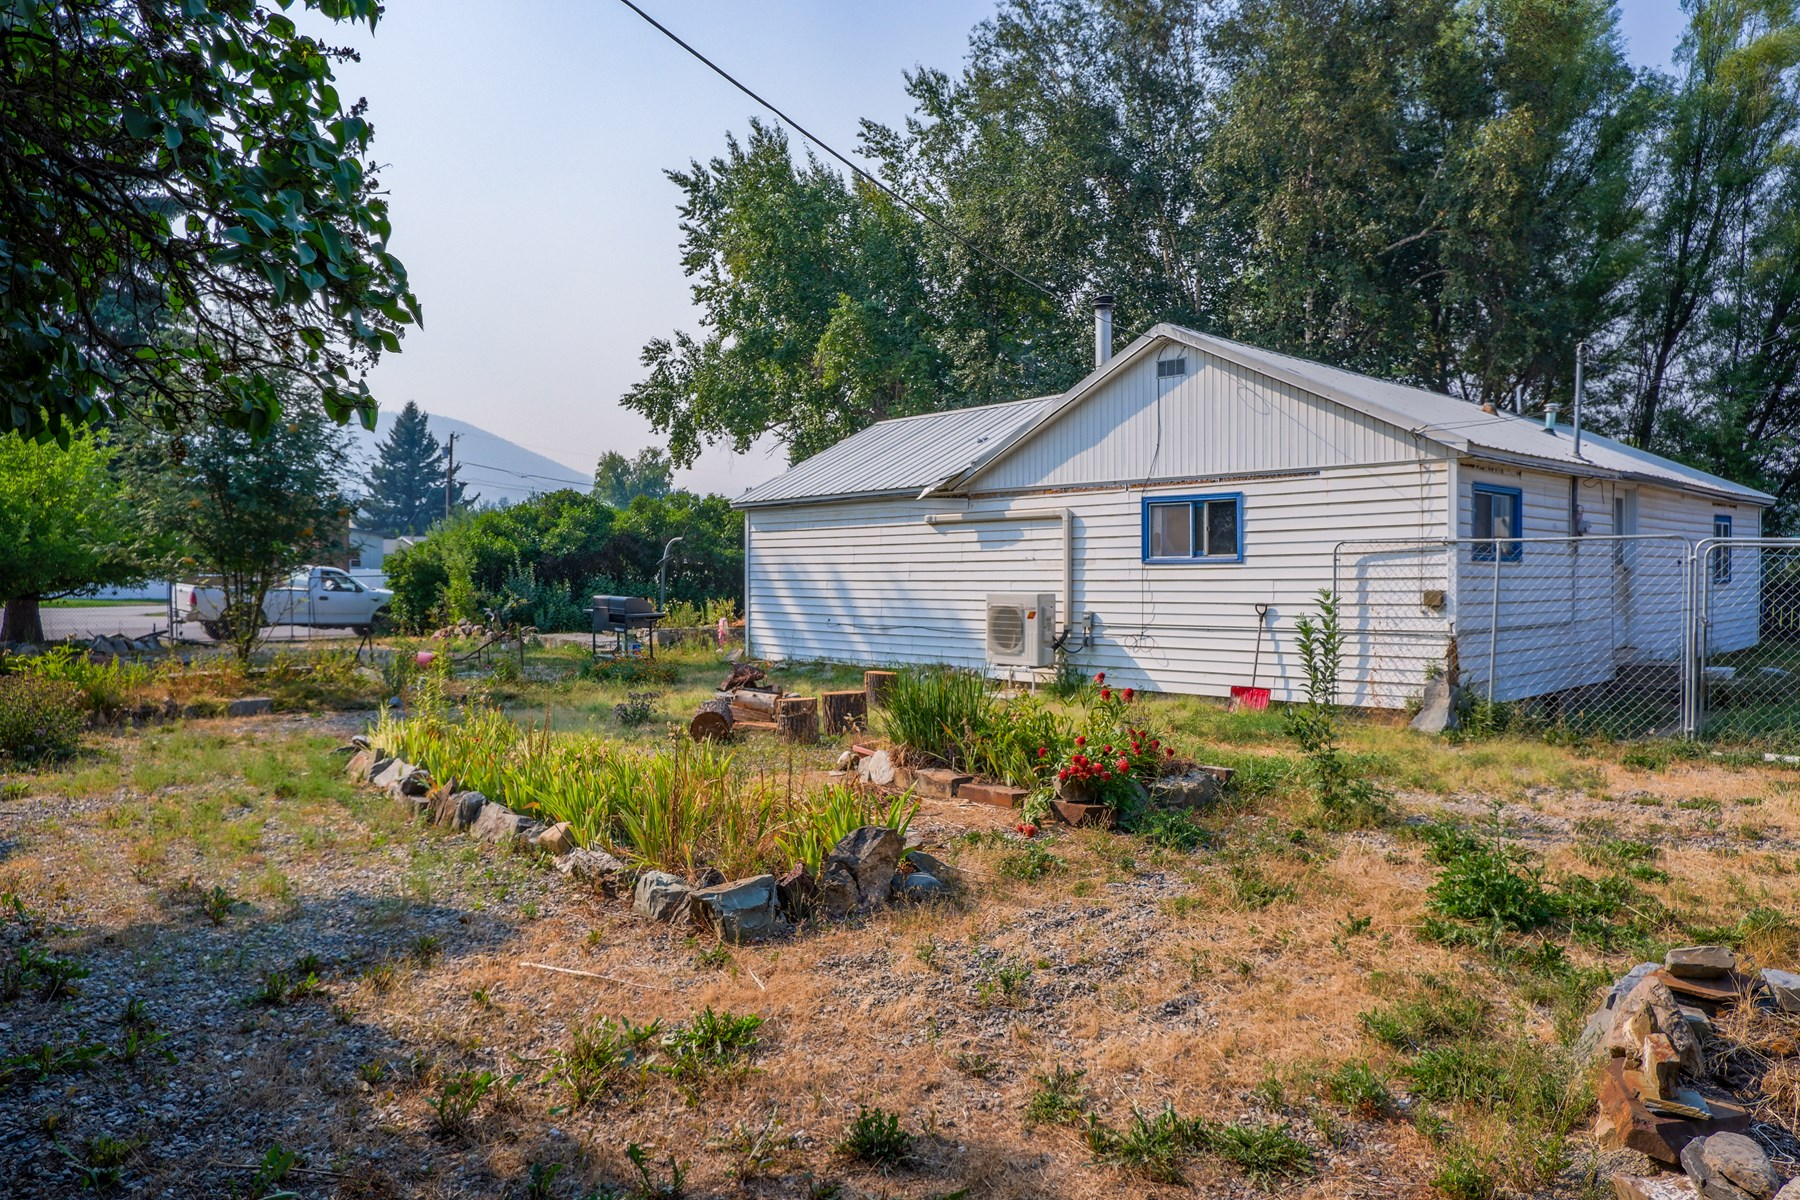 Single Level Home Near Kootenai River and National Forest